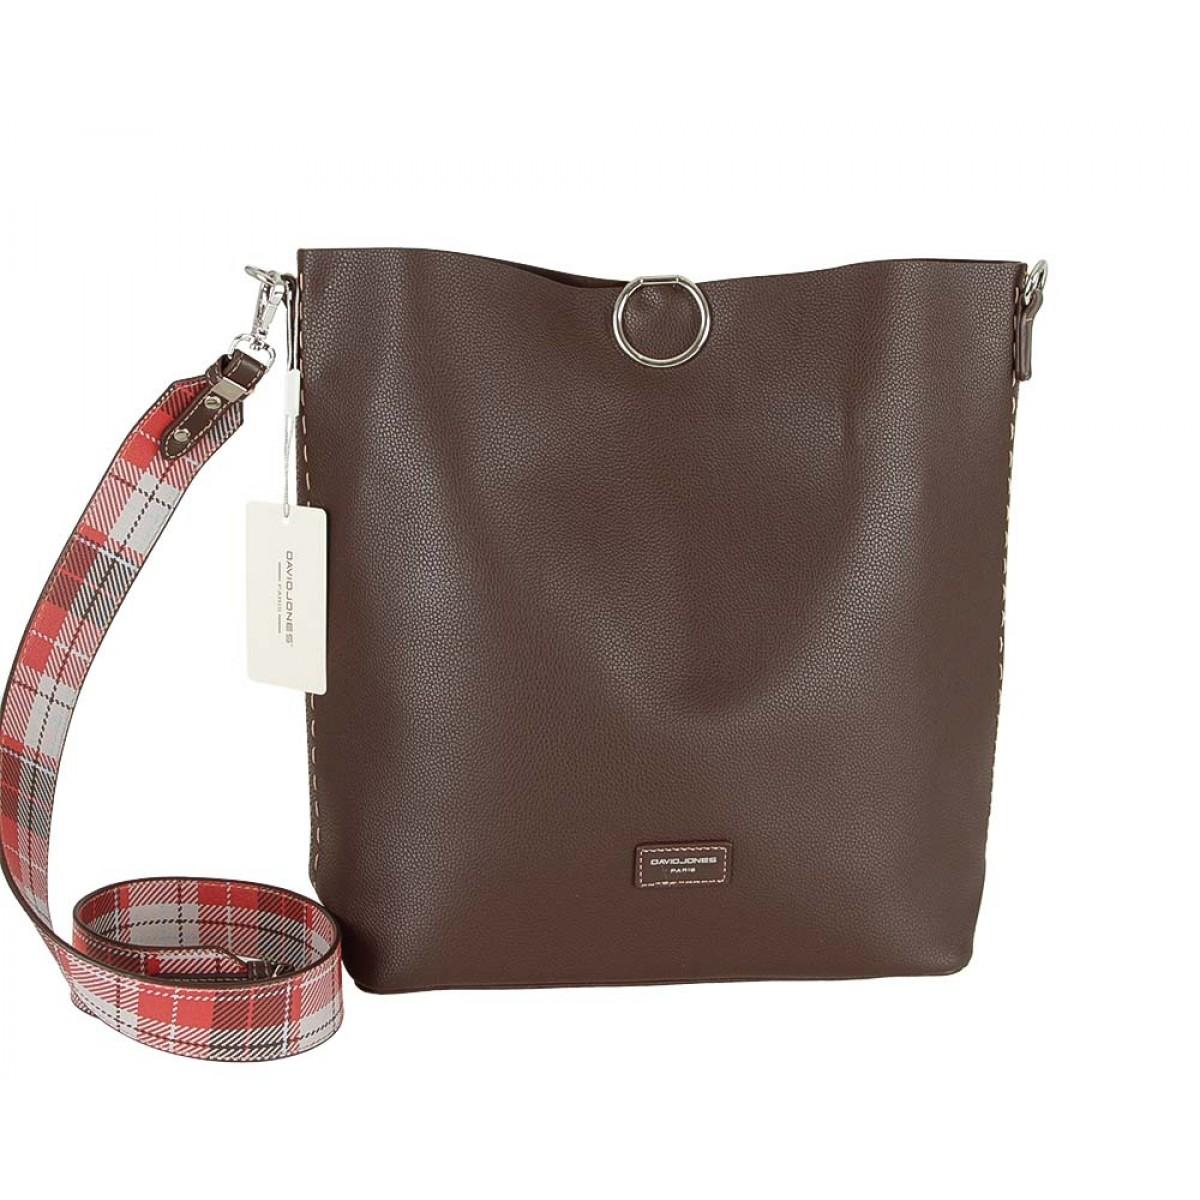 Жіноча сумка David Jones CM5468 D.BROWN